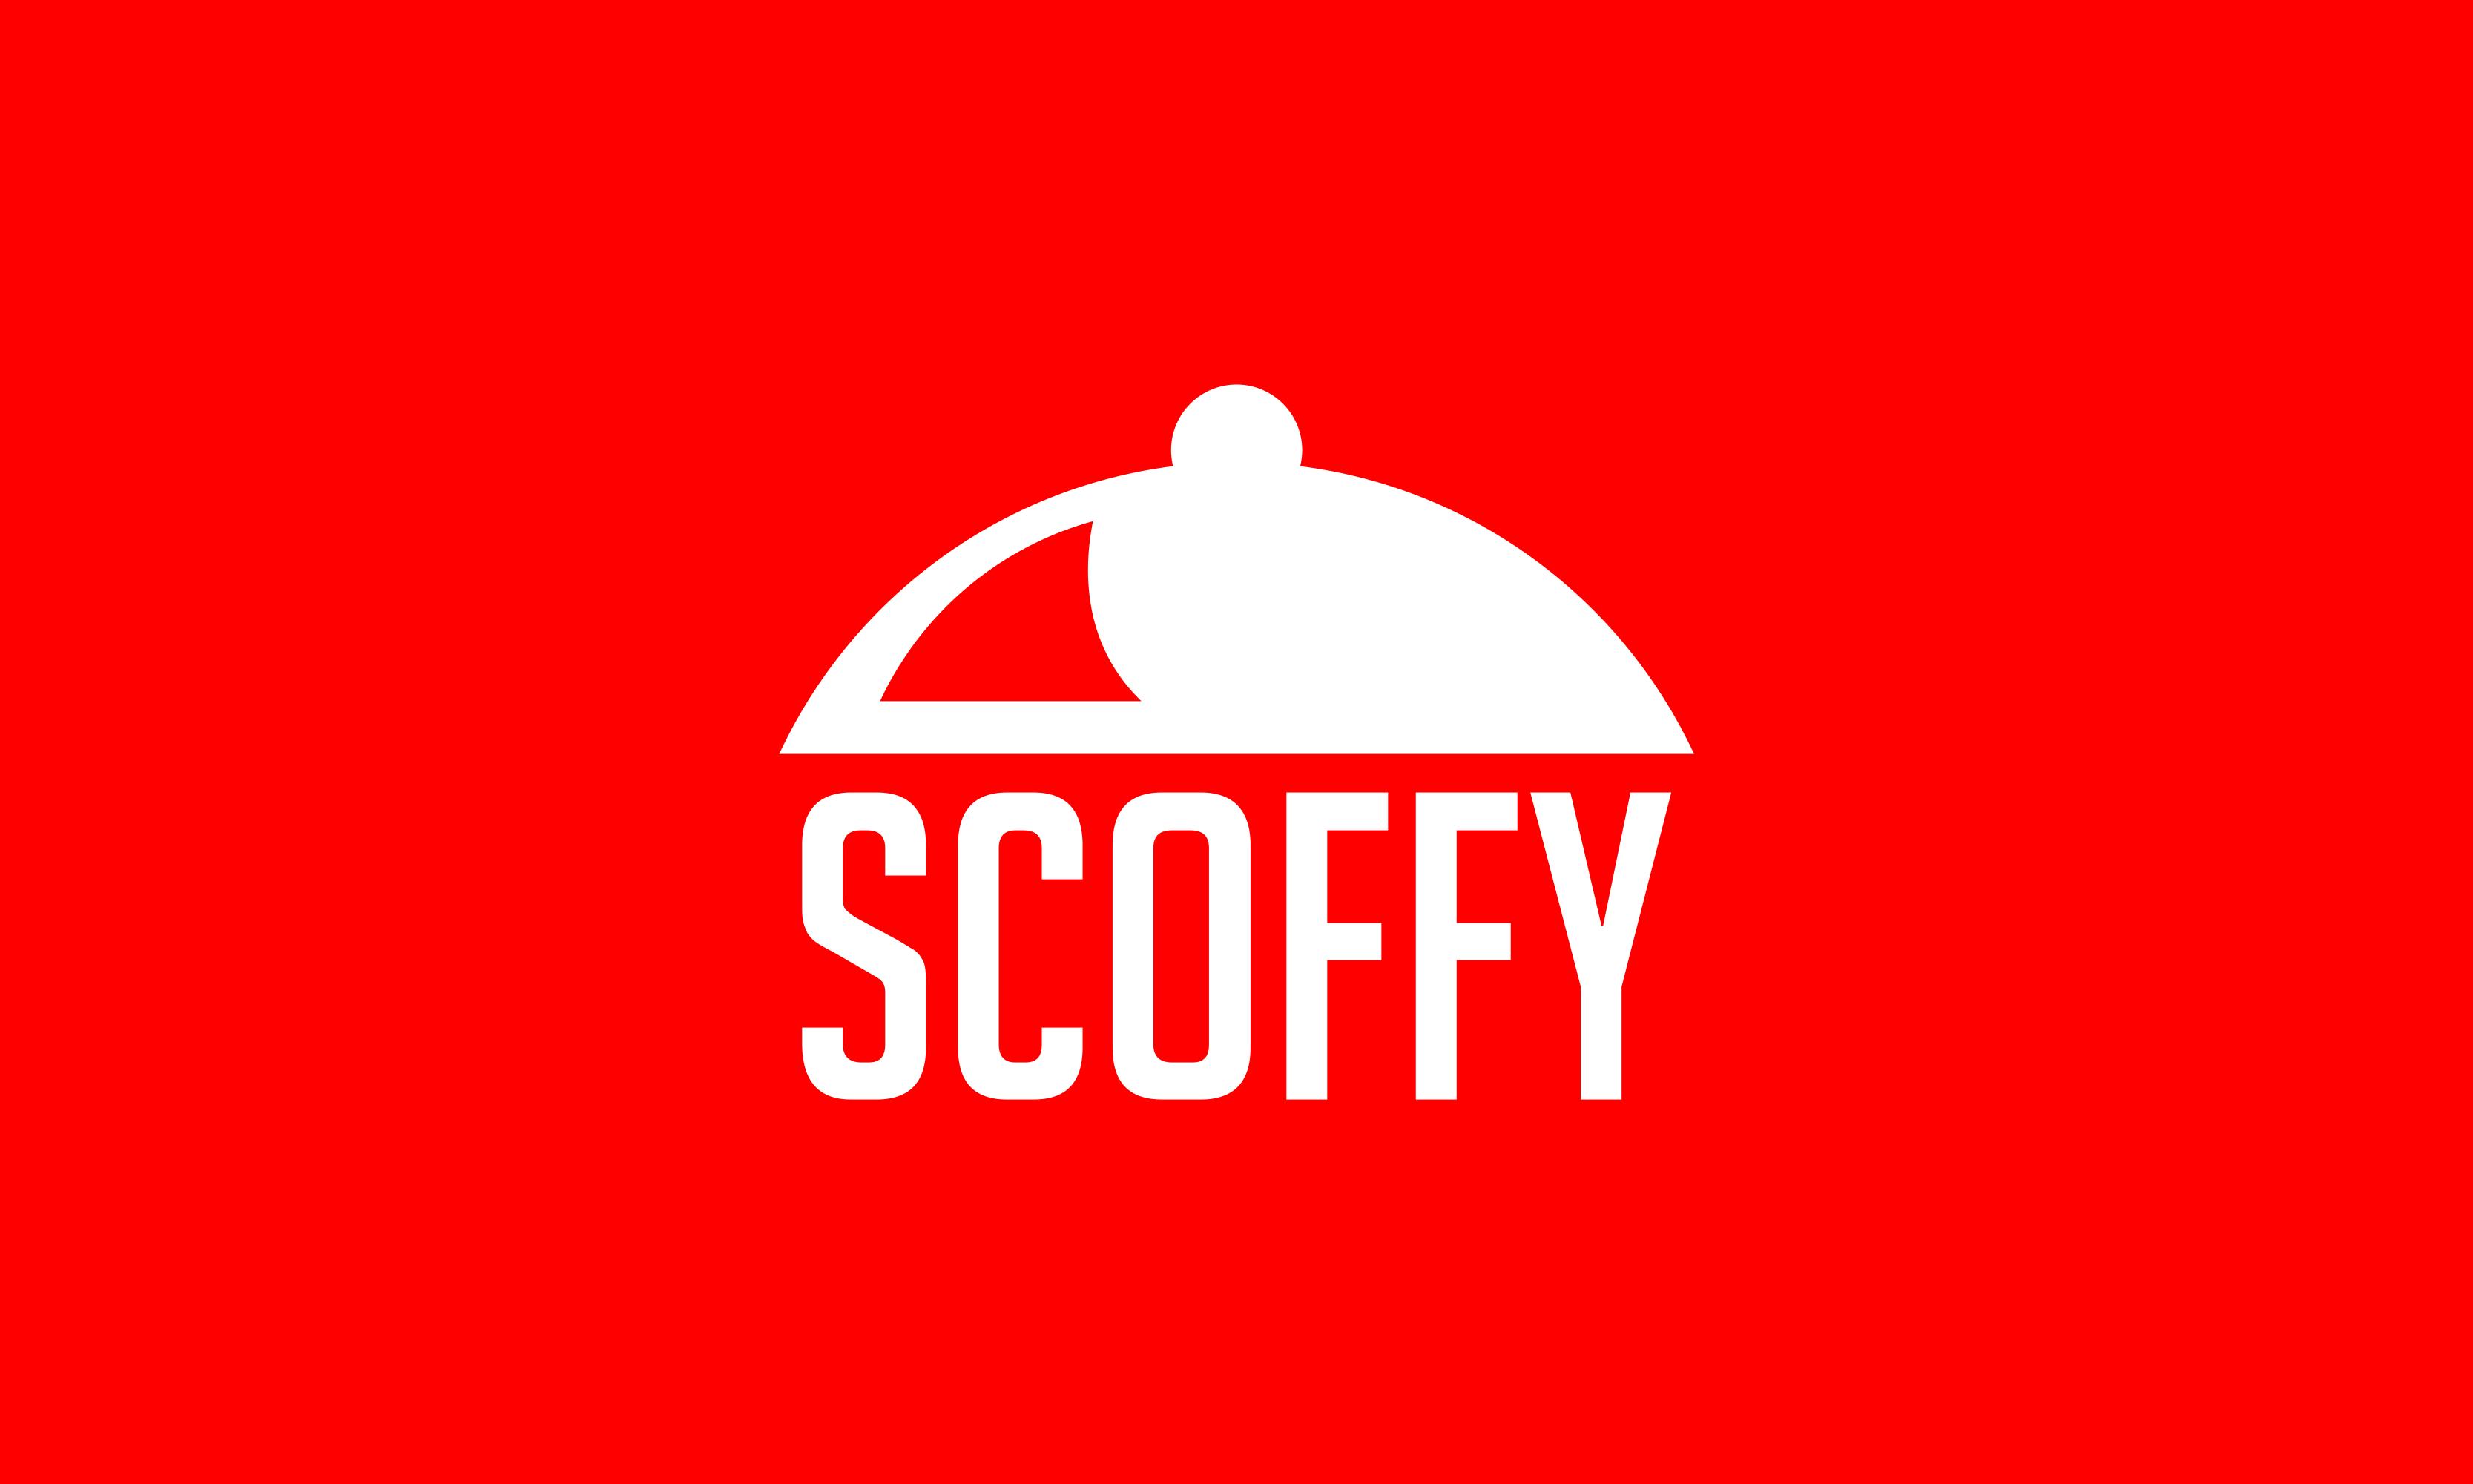 Scoffy